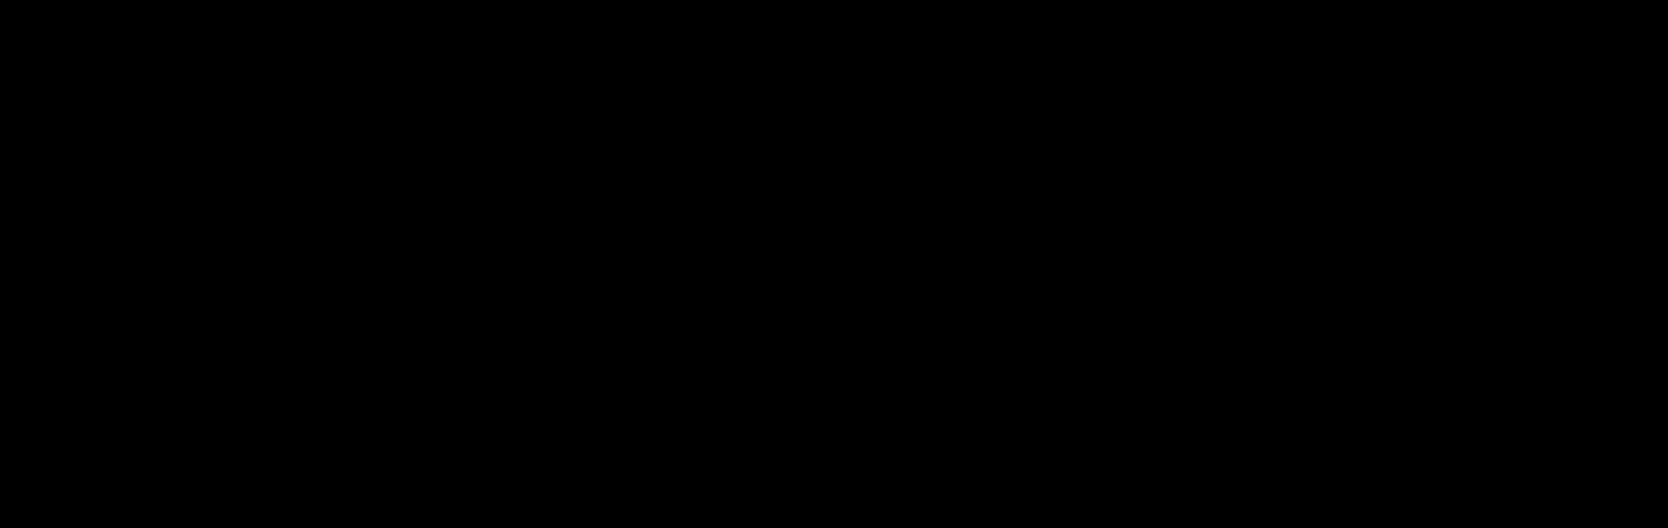 2,5-Dioxopyrrolidin-1-yl nonanoate